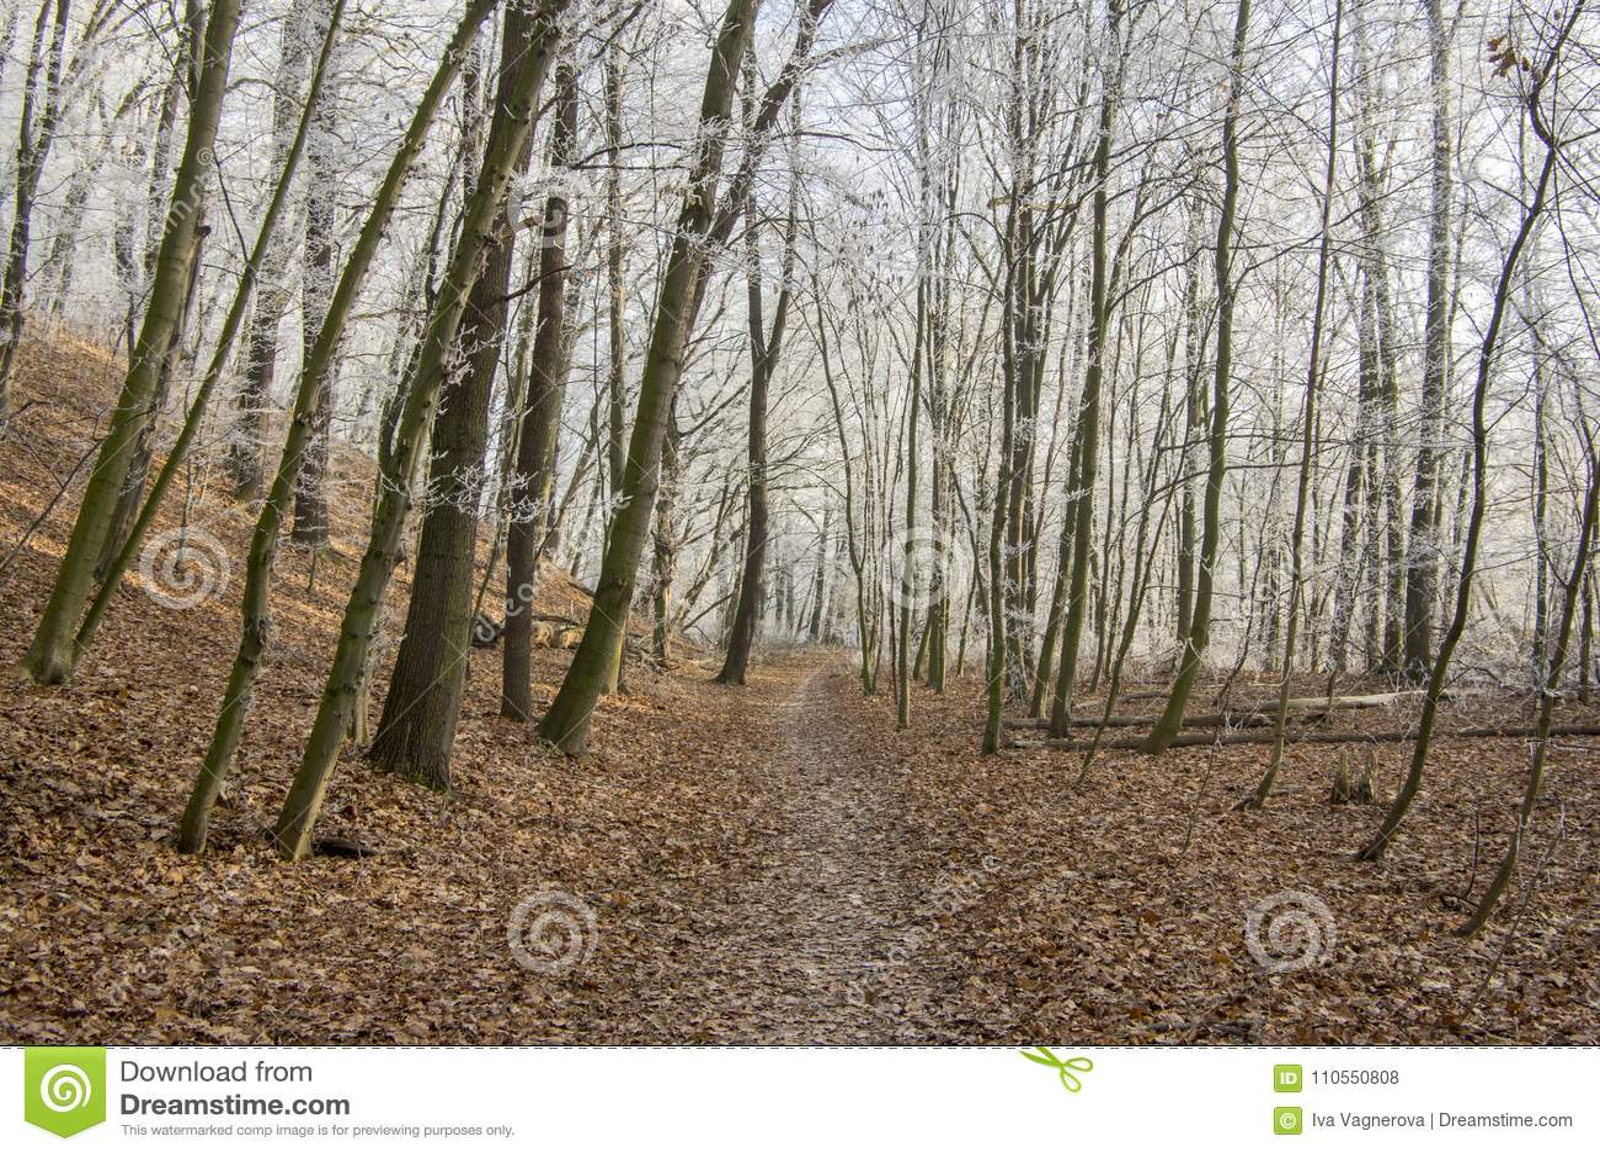 Nemosicka stran, hornbeam forest - interesting magic nature place in winter temperatures, frozen tree branches